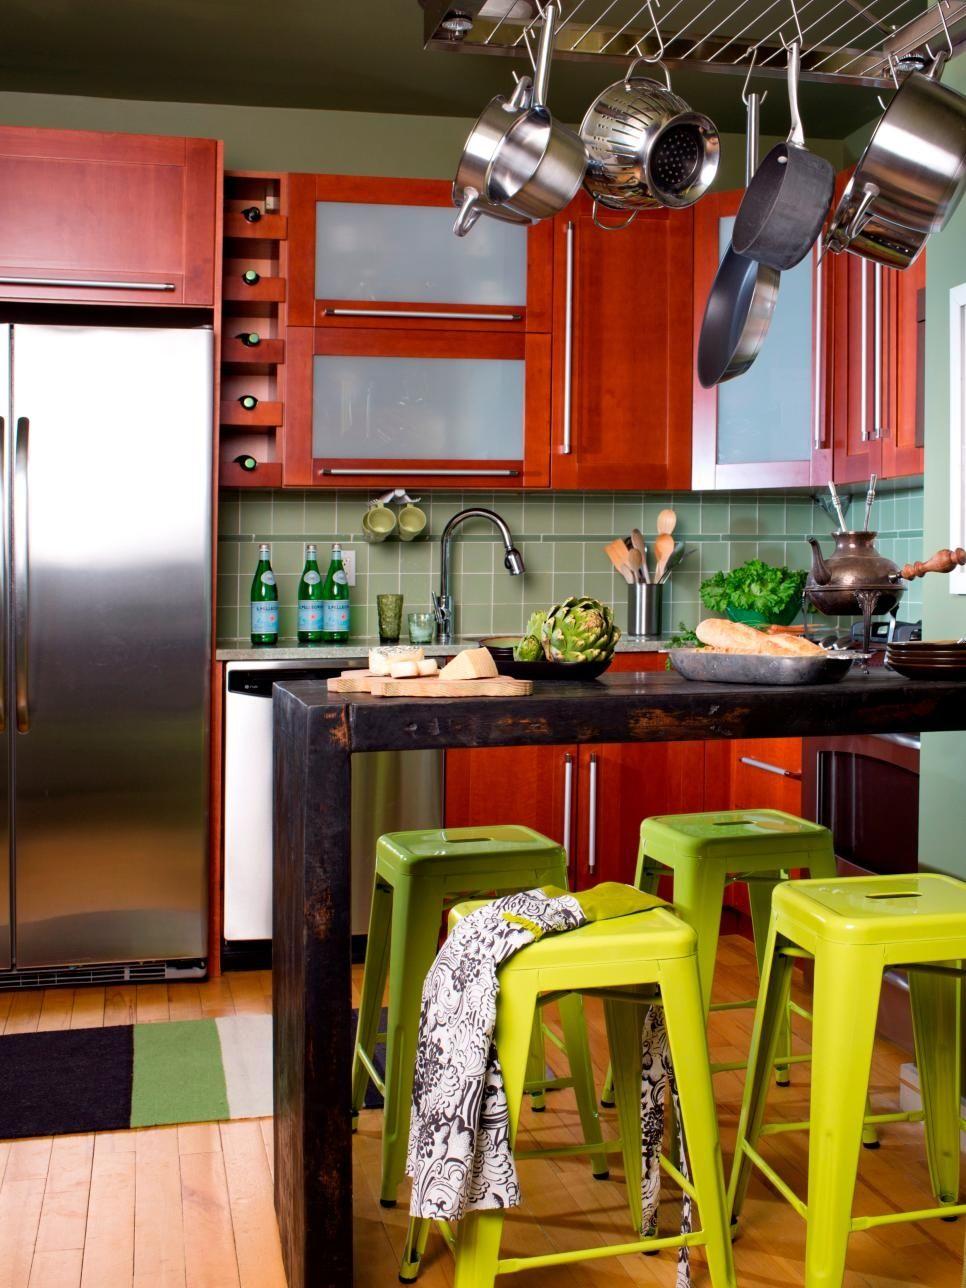 Kitchen Space Saving Ideaskitchen Design Ideas#stoneamperor Stunning Space Saving Kitchen Designs Decorating Inspiration